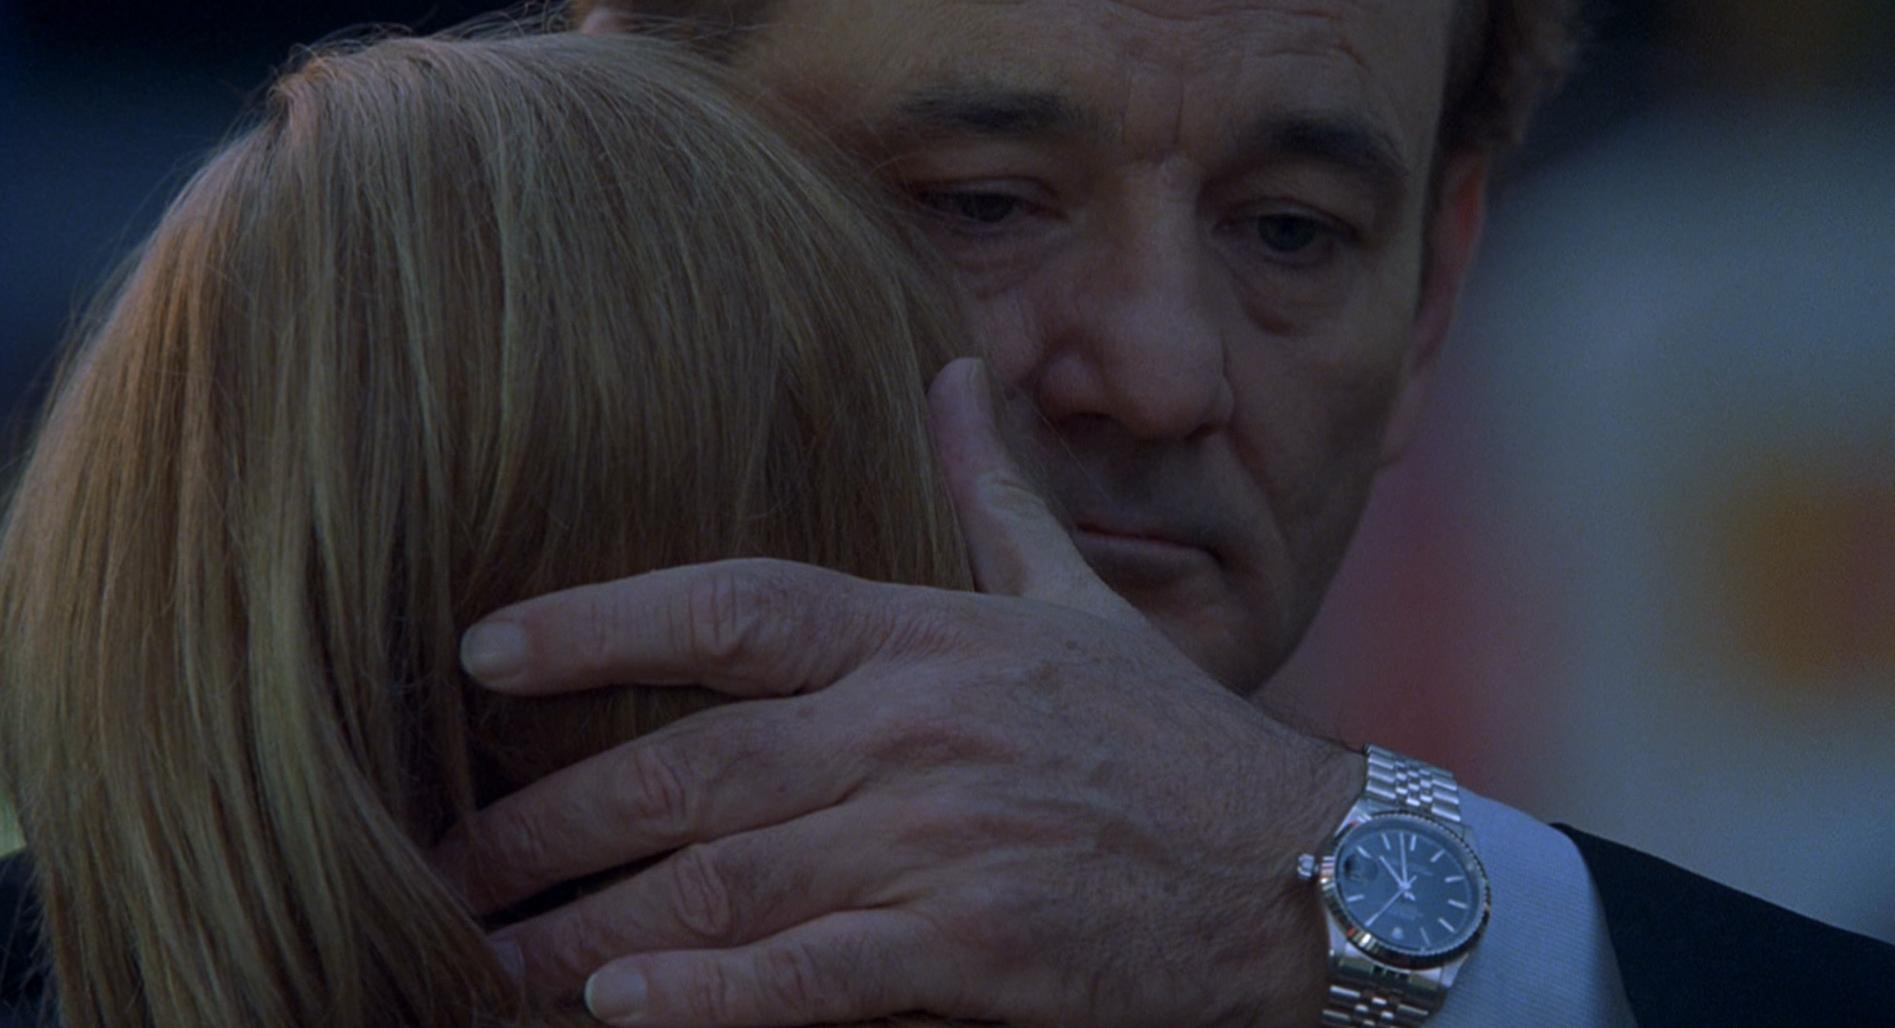 abbracci-cinema-film-lost-murray